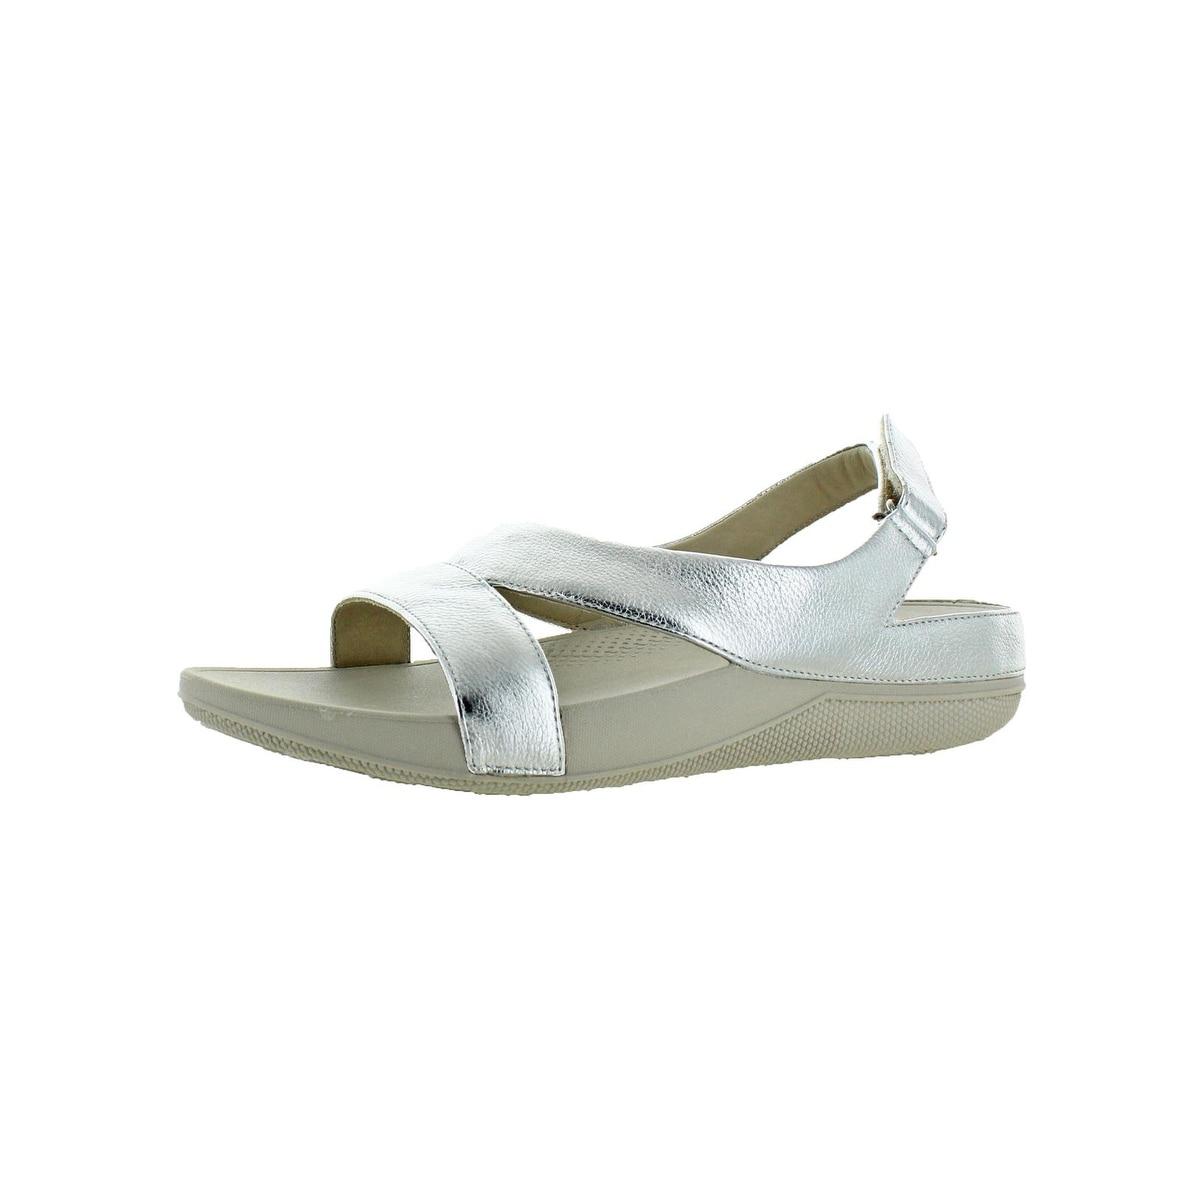 25b62f43bff1b Shop Fitflop Womens Superlight Ringer Slide Sandals Leather Slip On - 9  Medium (B